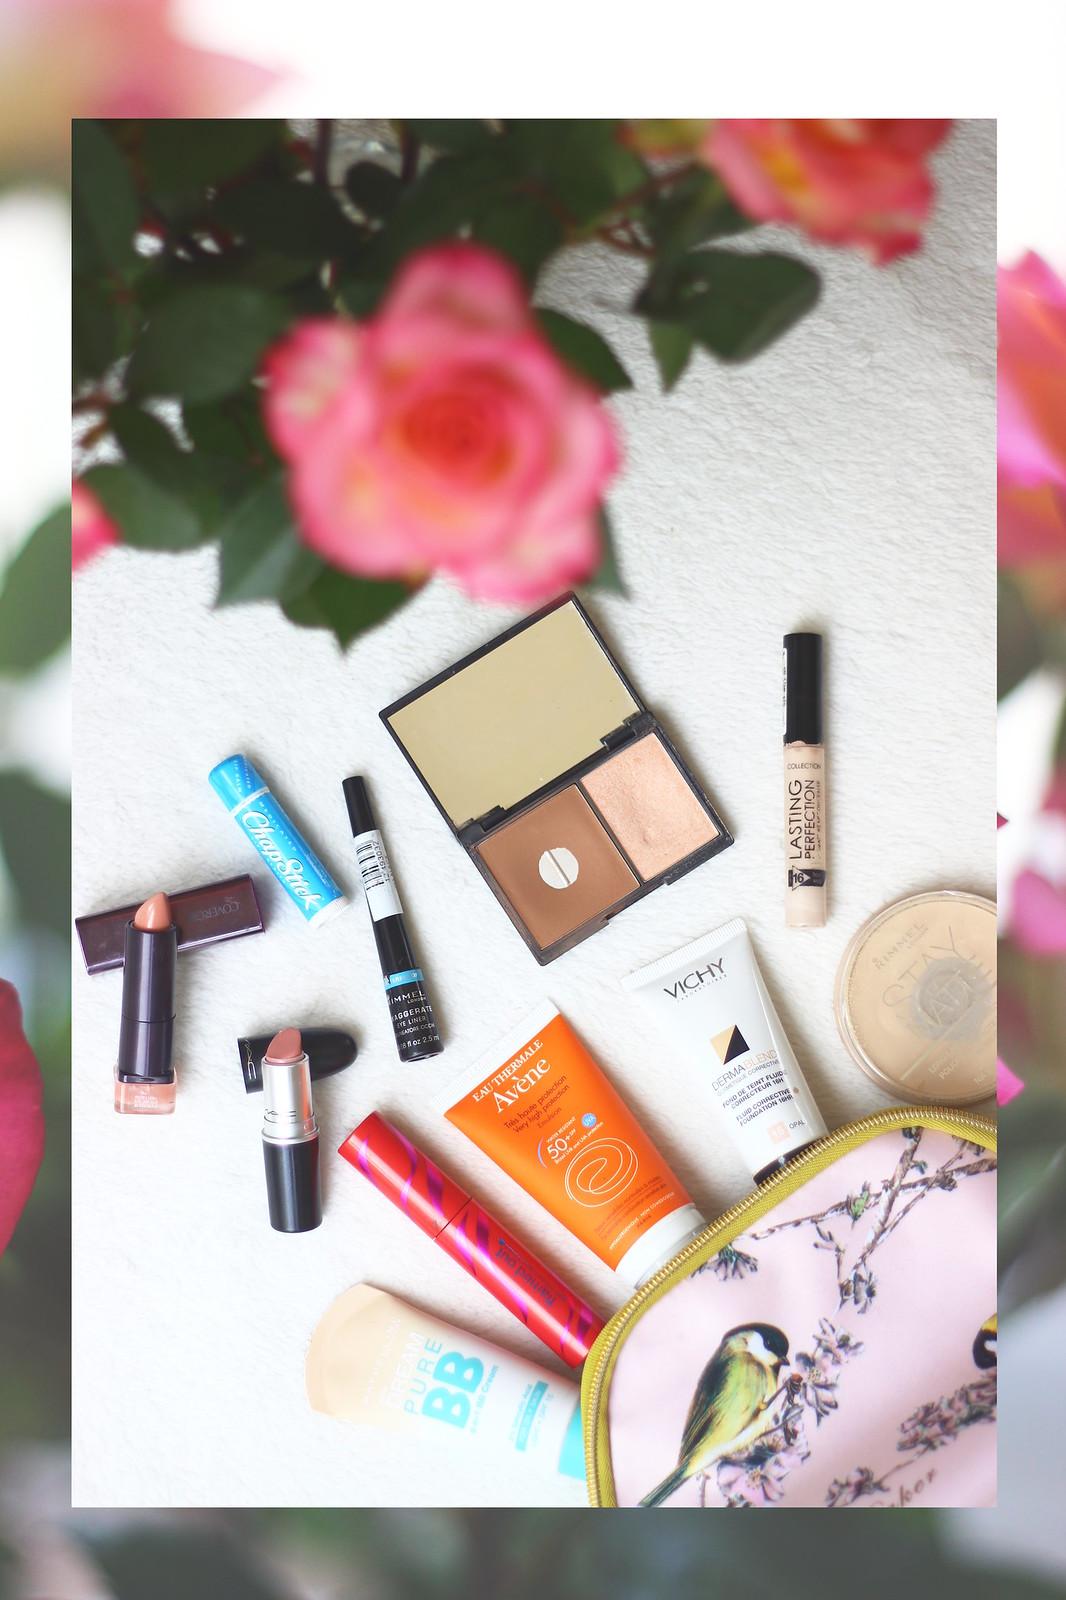 IMG_7858 layered, make up, everyday, beauty, products, avene, skincare, high street